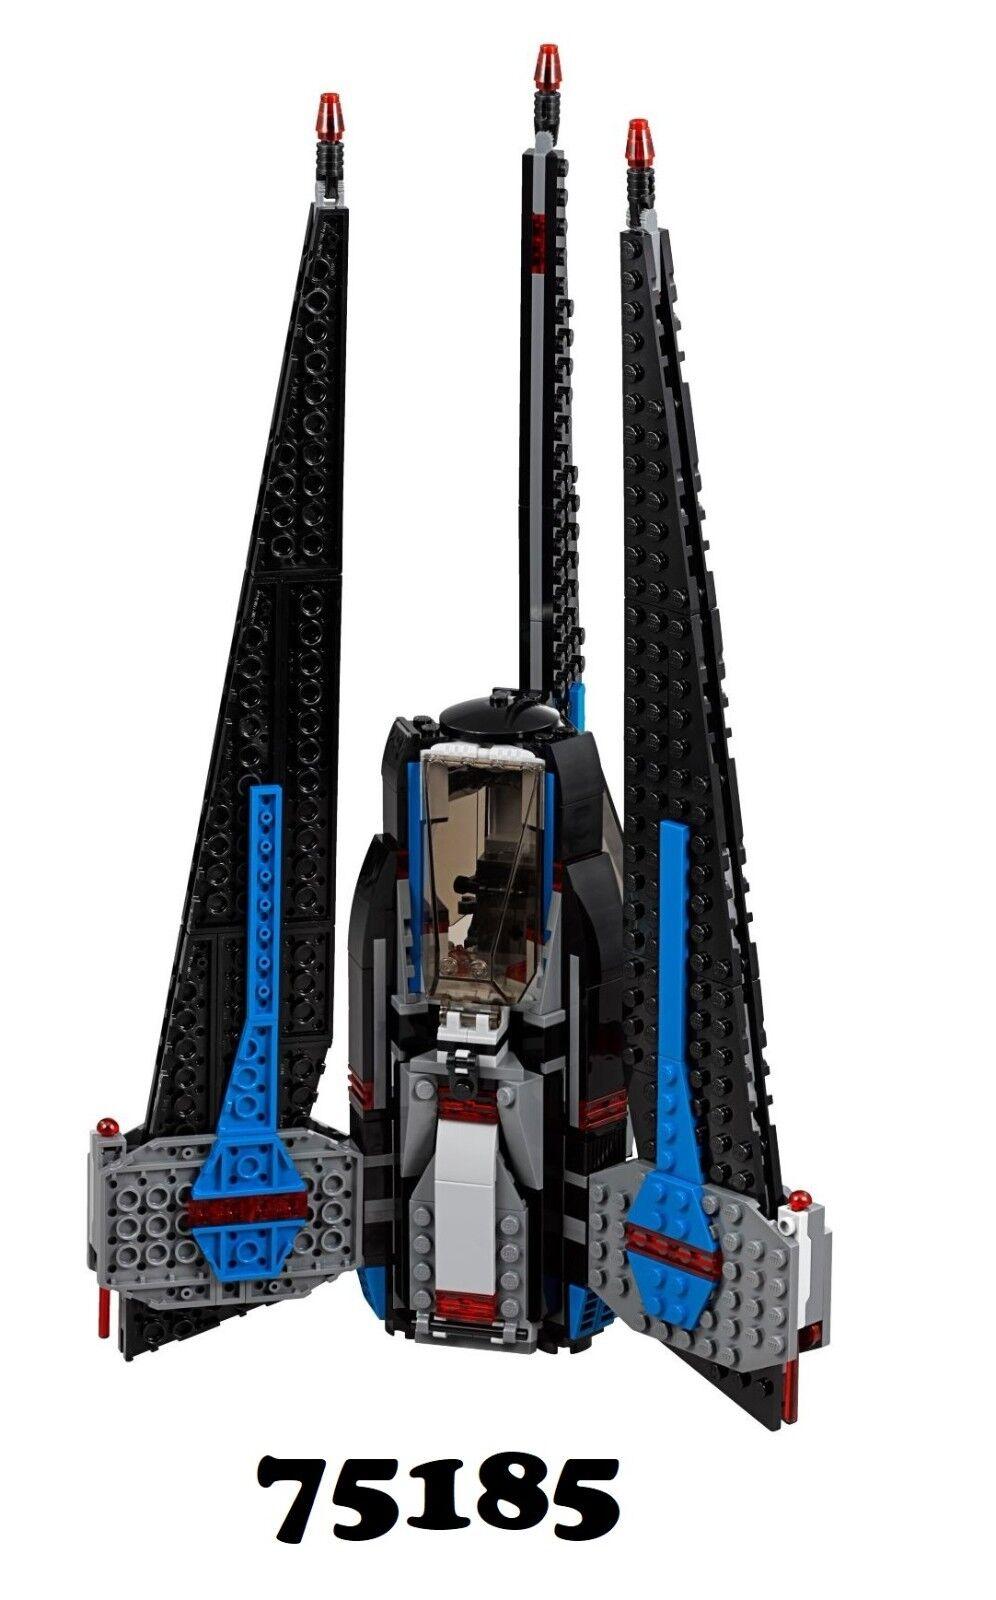 NEW Lego Star Wars 75185 Tracker I NO MINIFIGURES